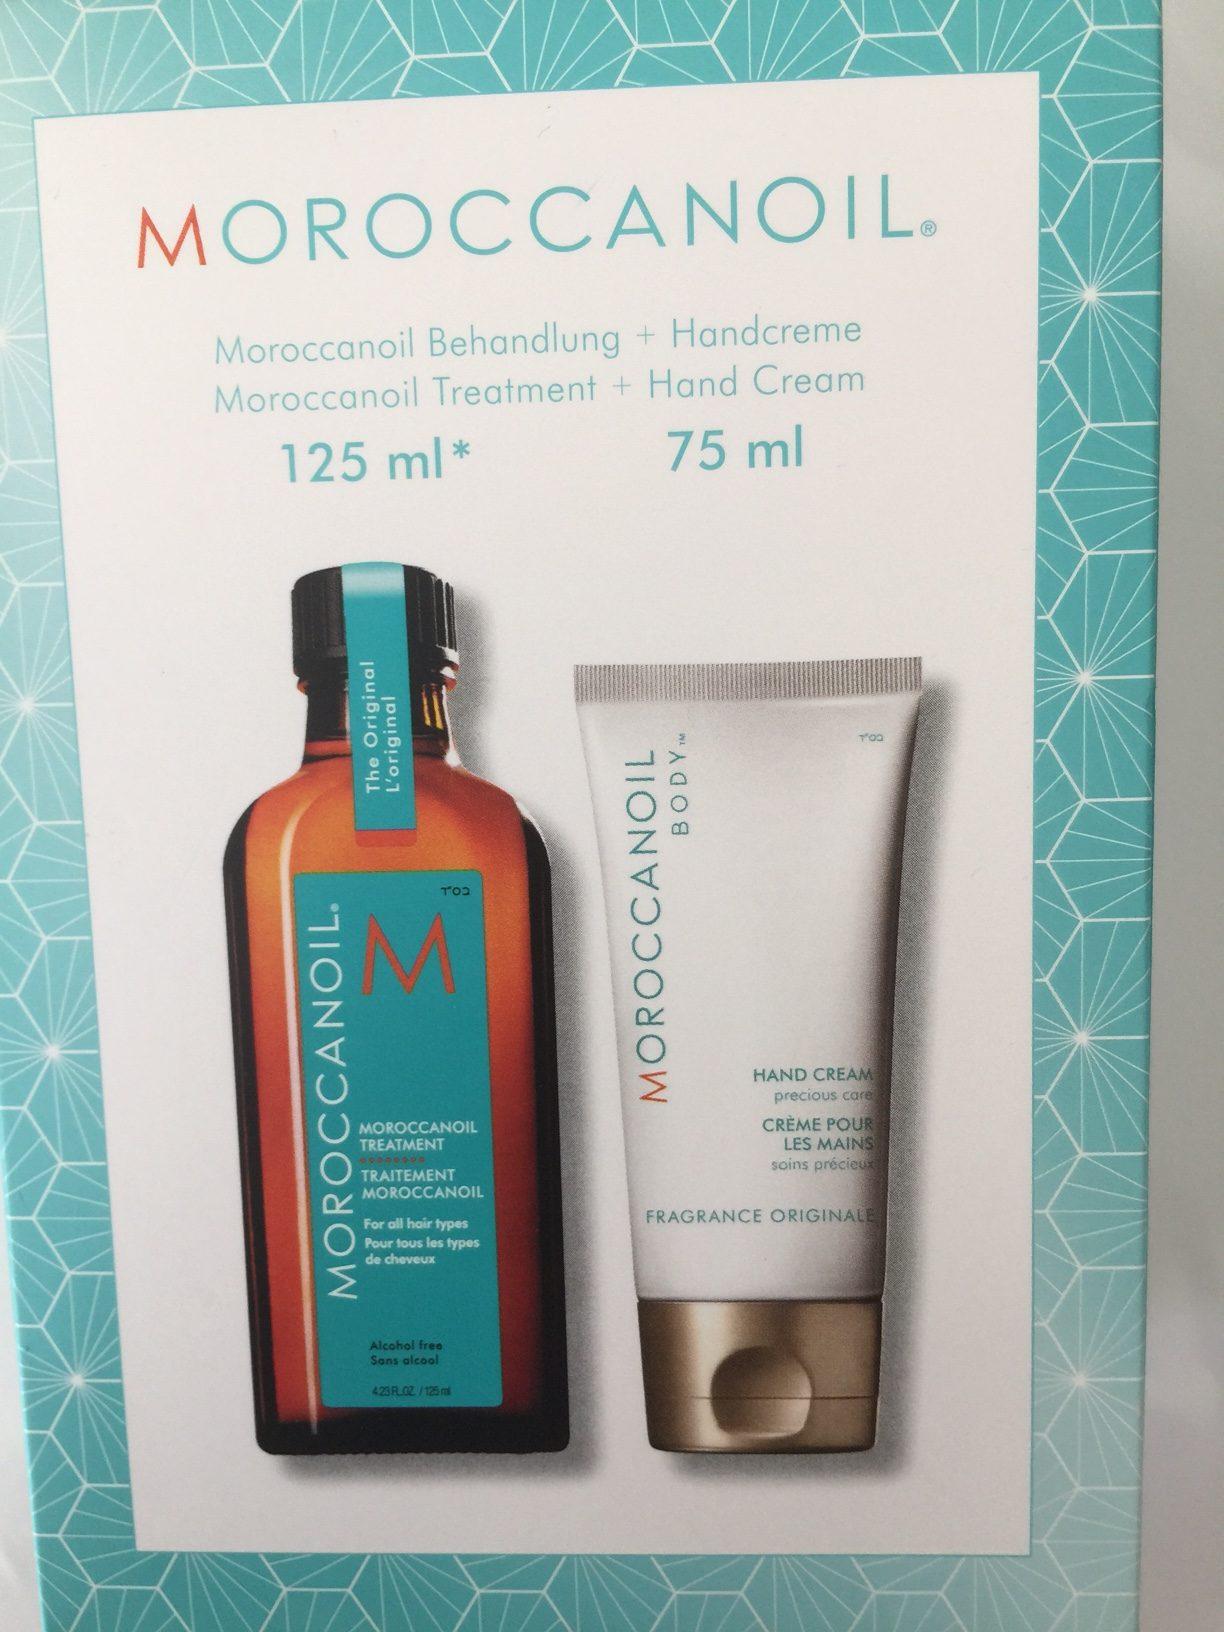 Moroccanoil Öl 125ml + gratis Handcreme